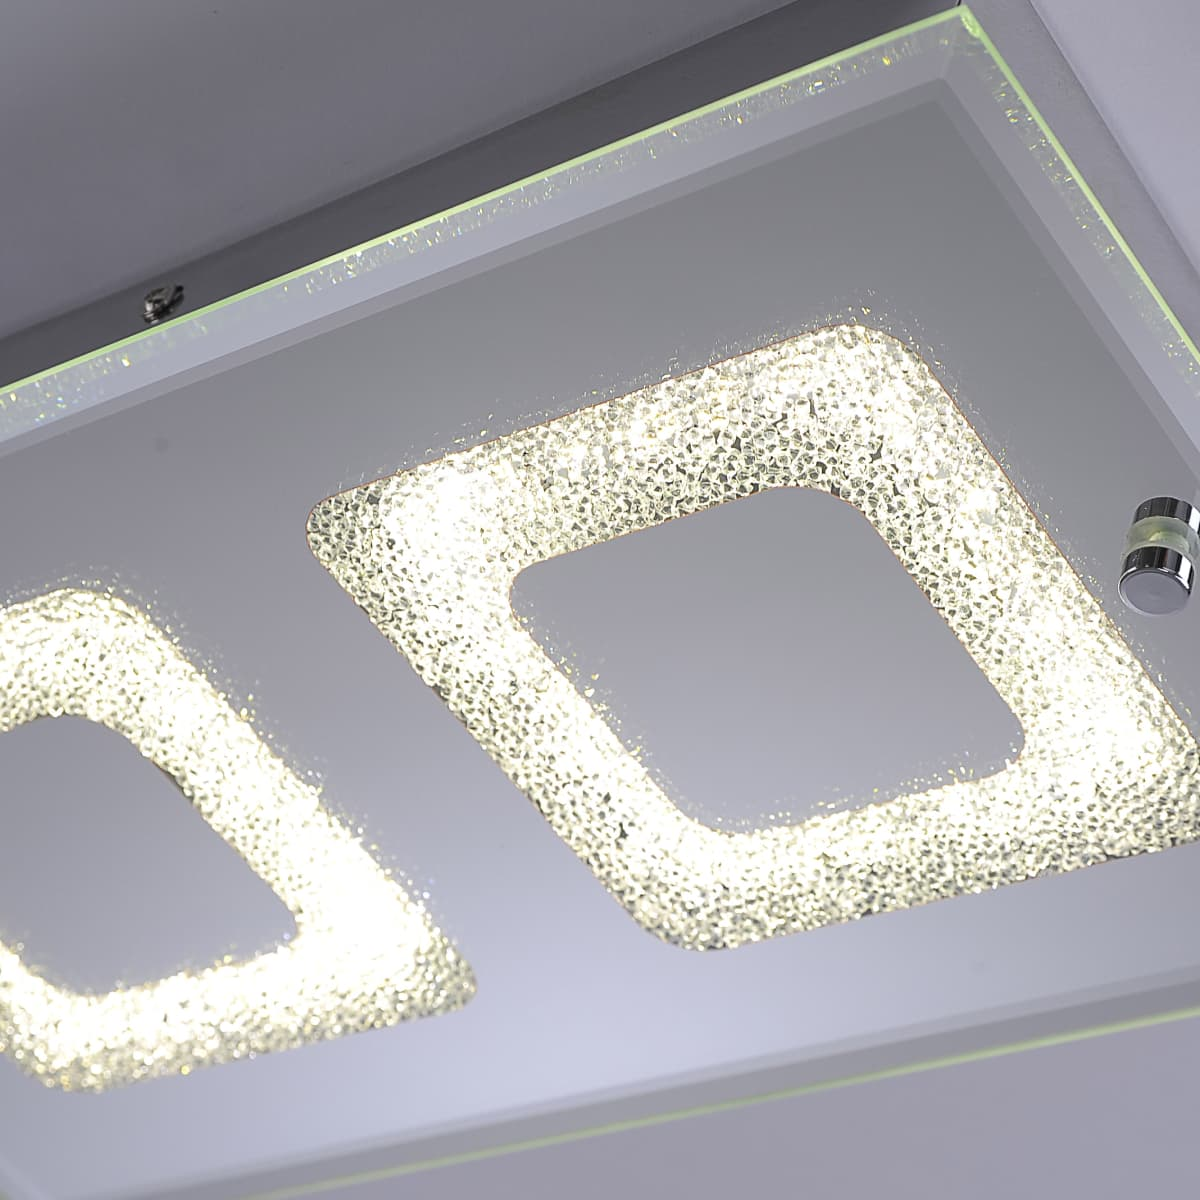 LED Deckenleuchte, Chrom, 2-flammig, Glas